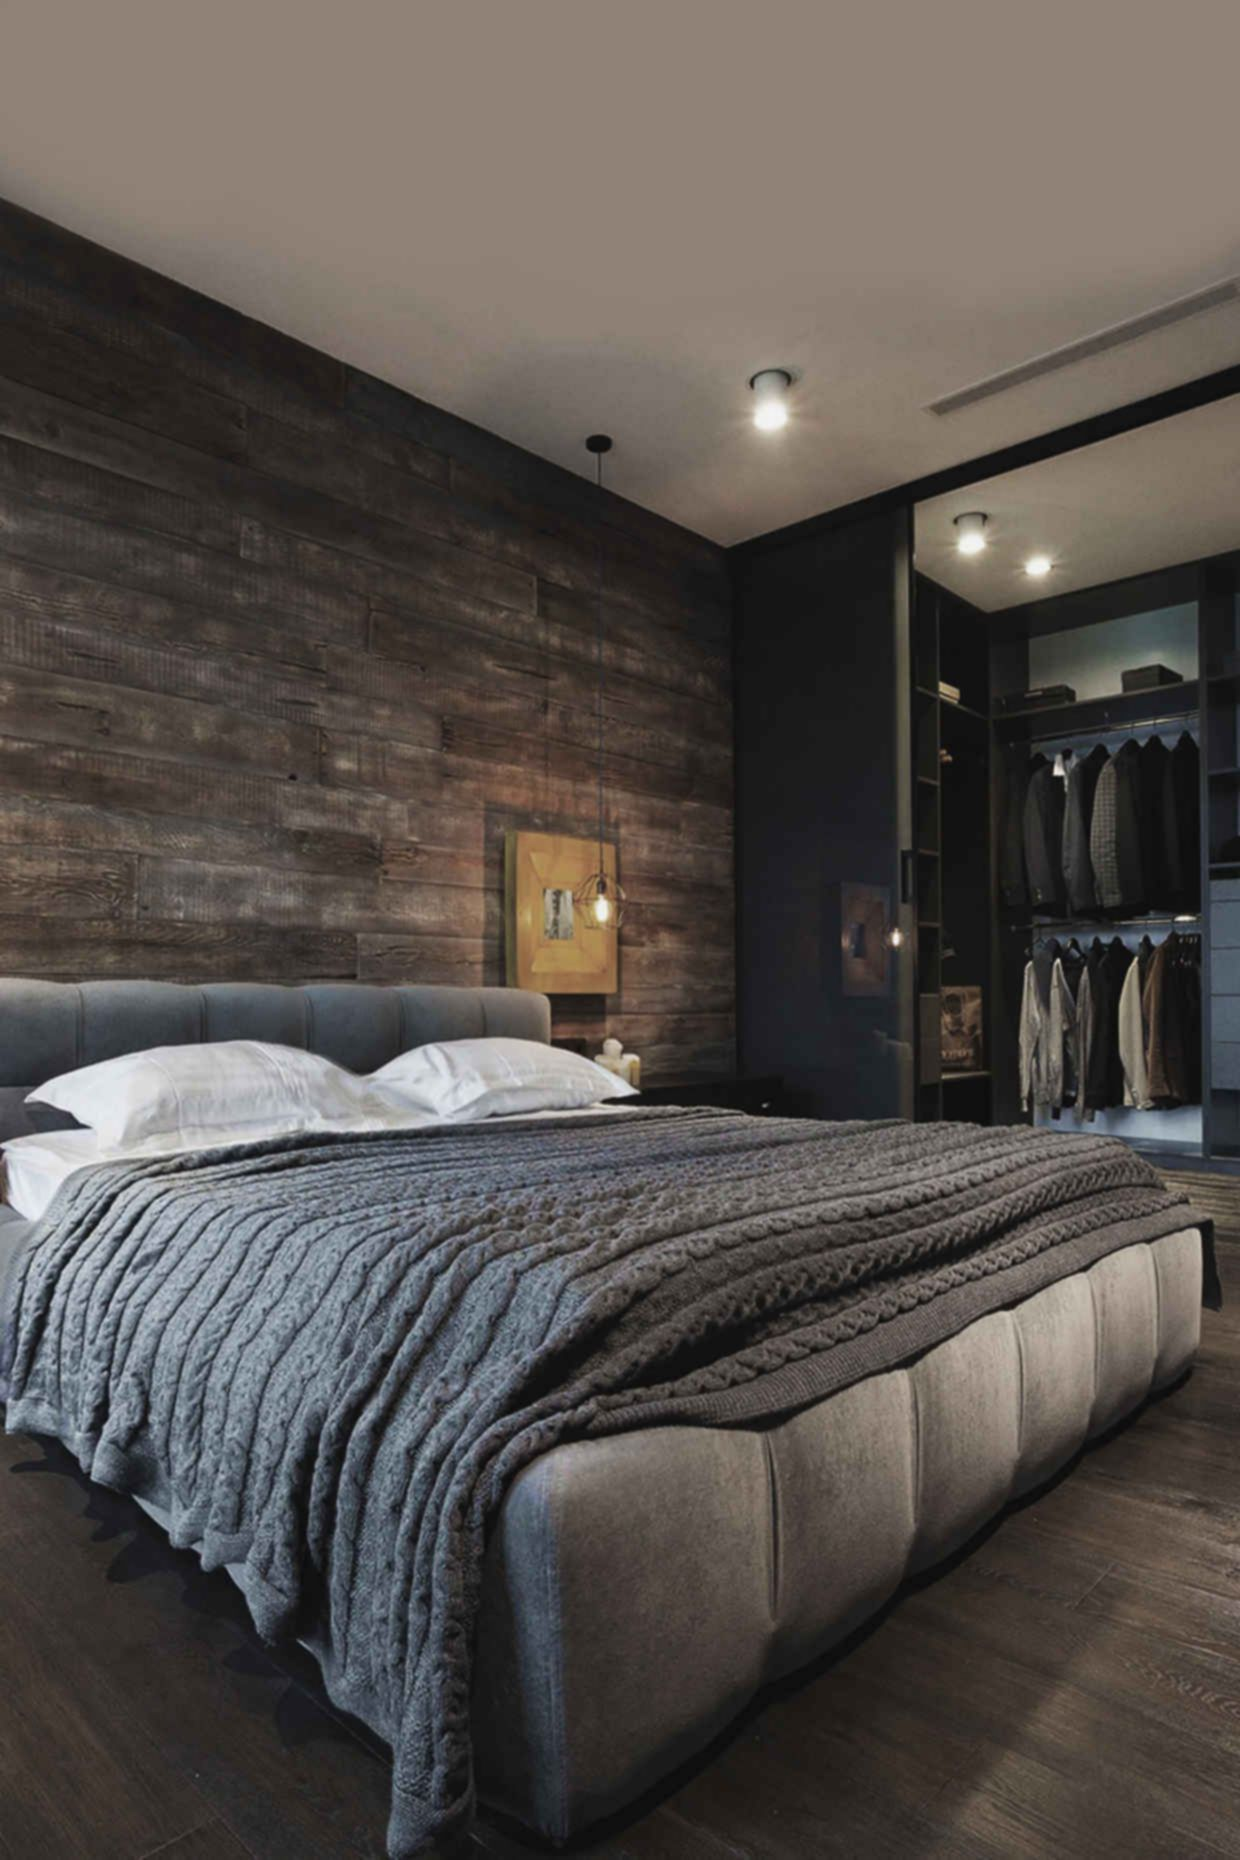 32 Top Stilvolle Bachelor Pad Schlafzimmer Ideen Fur Coole Manner